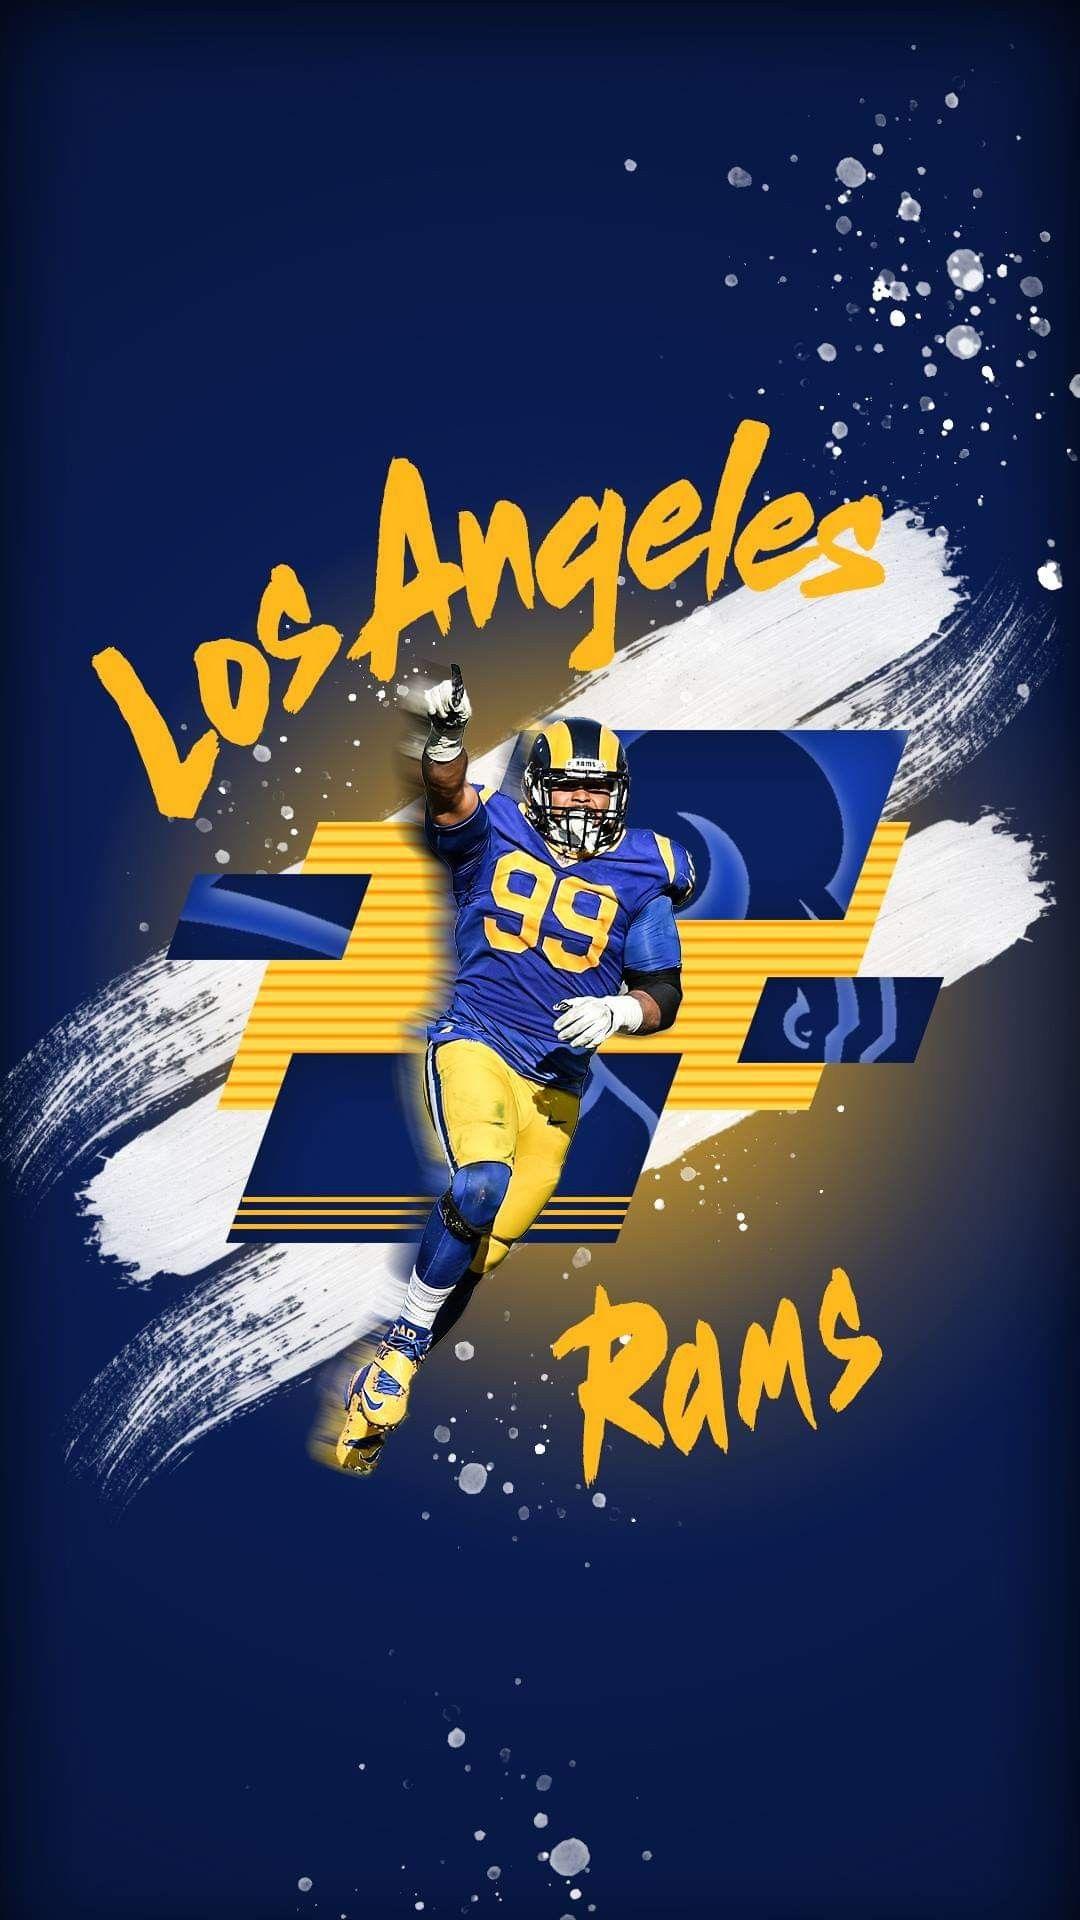 Pin by Rene Winter on LA Rams Football wallpaper Rams football 1080x1920